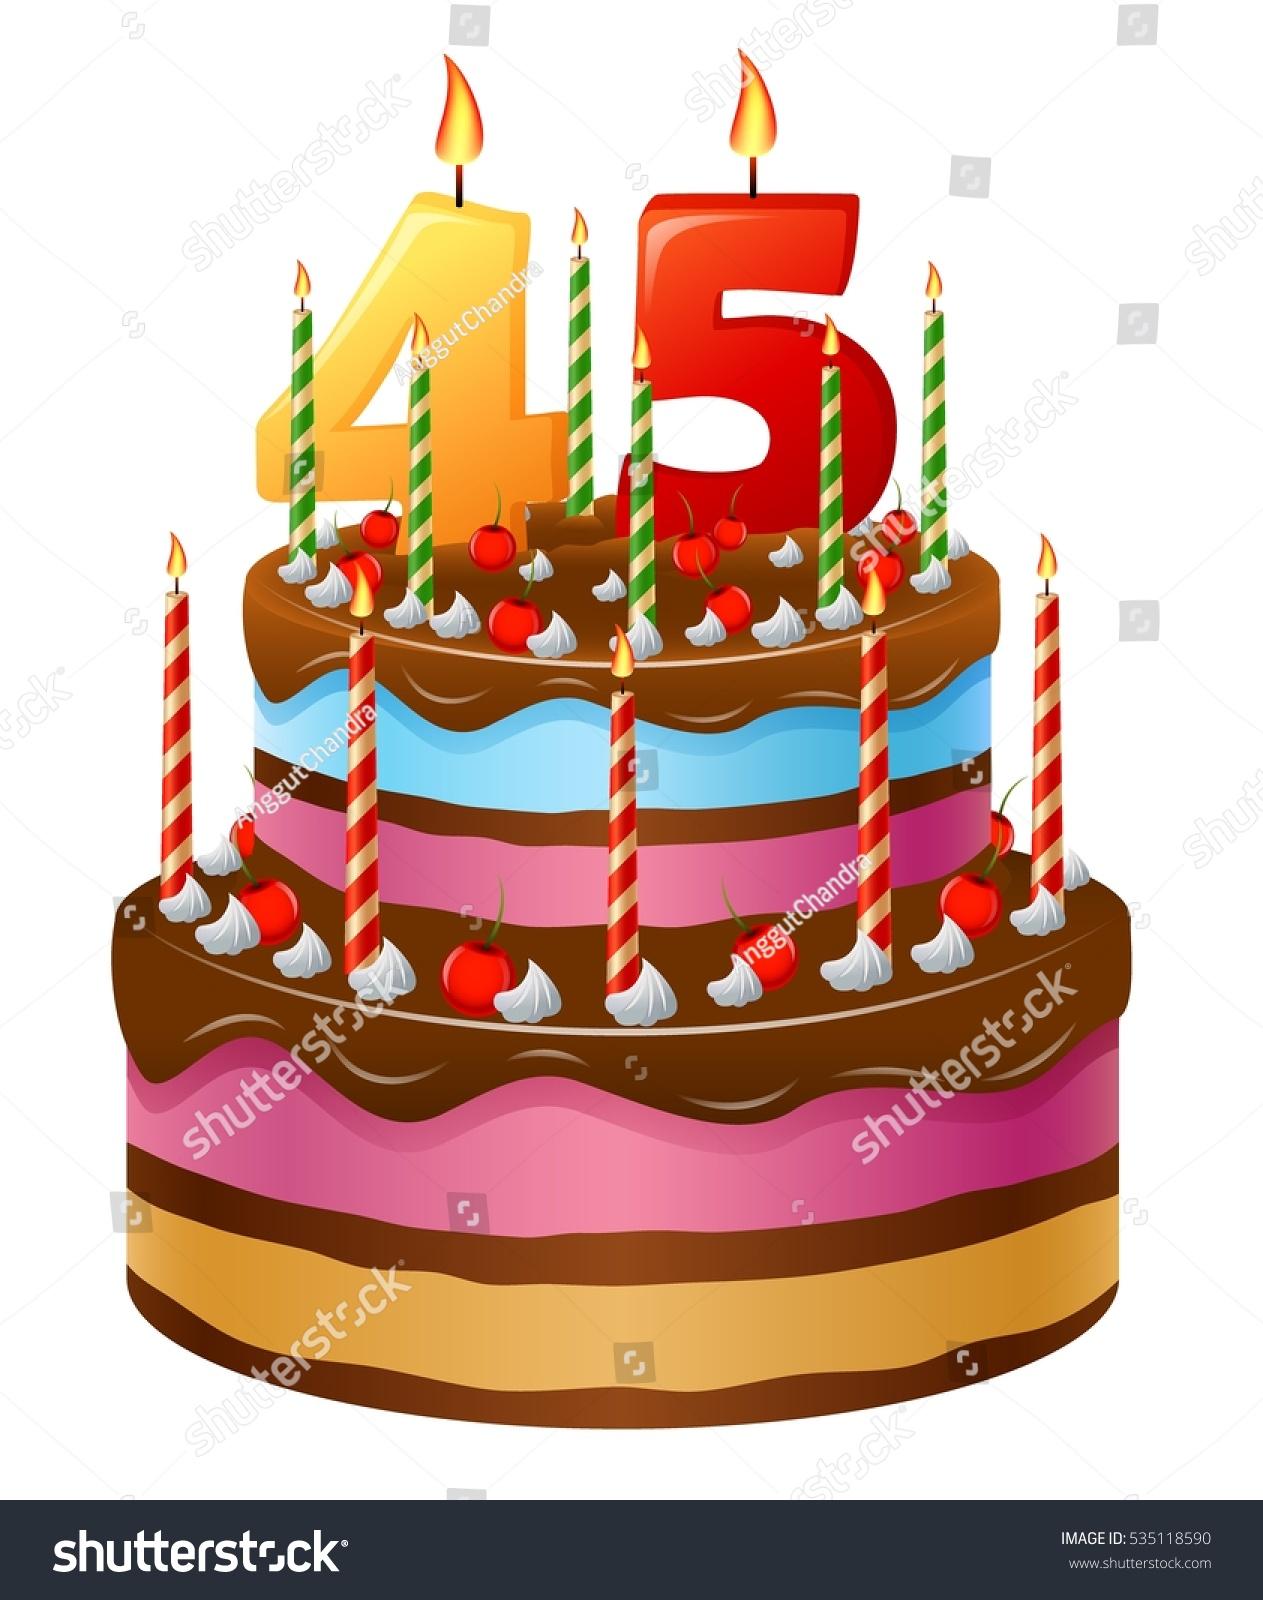 Groovy Happy Birthday Cake 45 Stock Vector Royalty Free 535118590 Personalised Birthday Cards Paralily Jamesorg